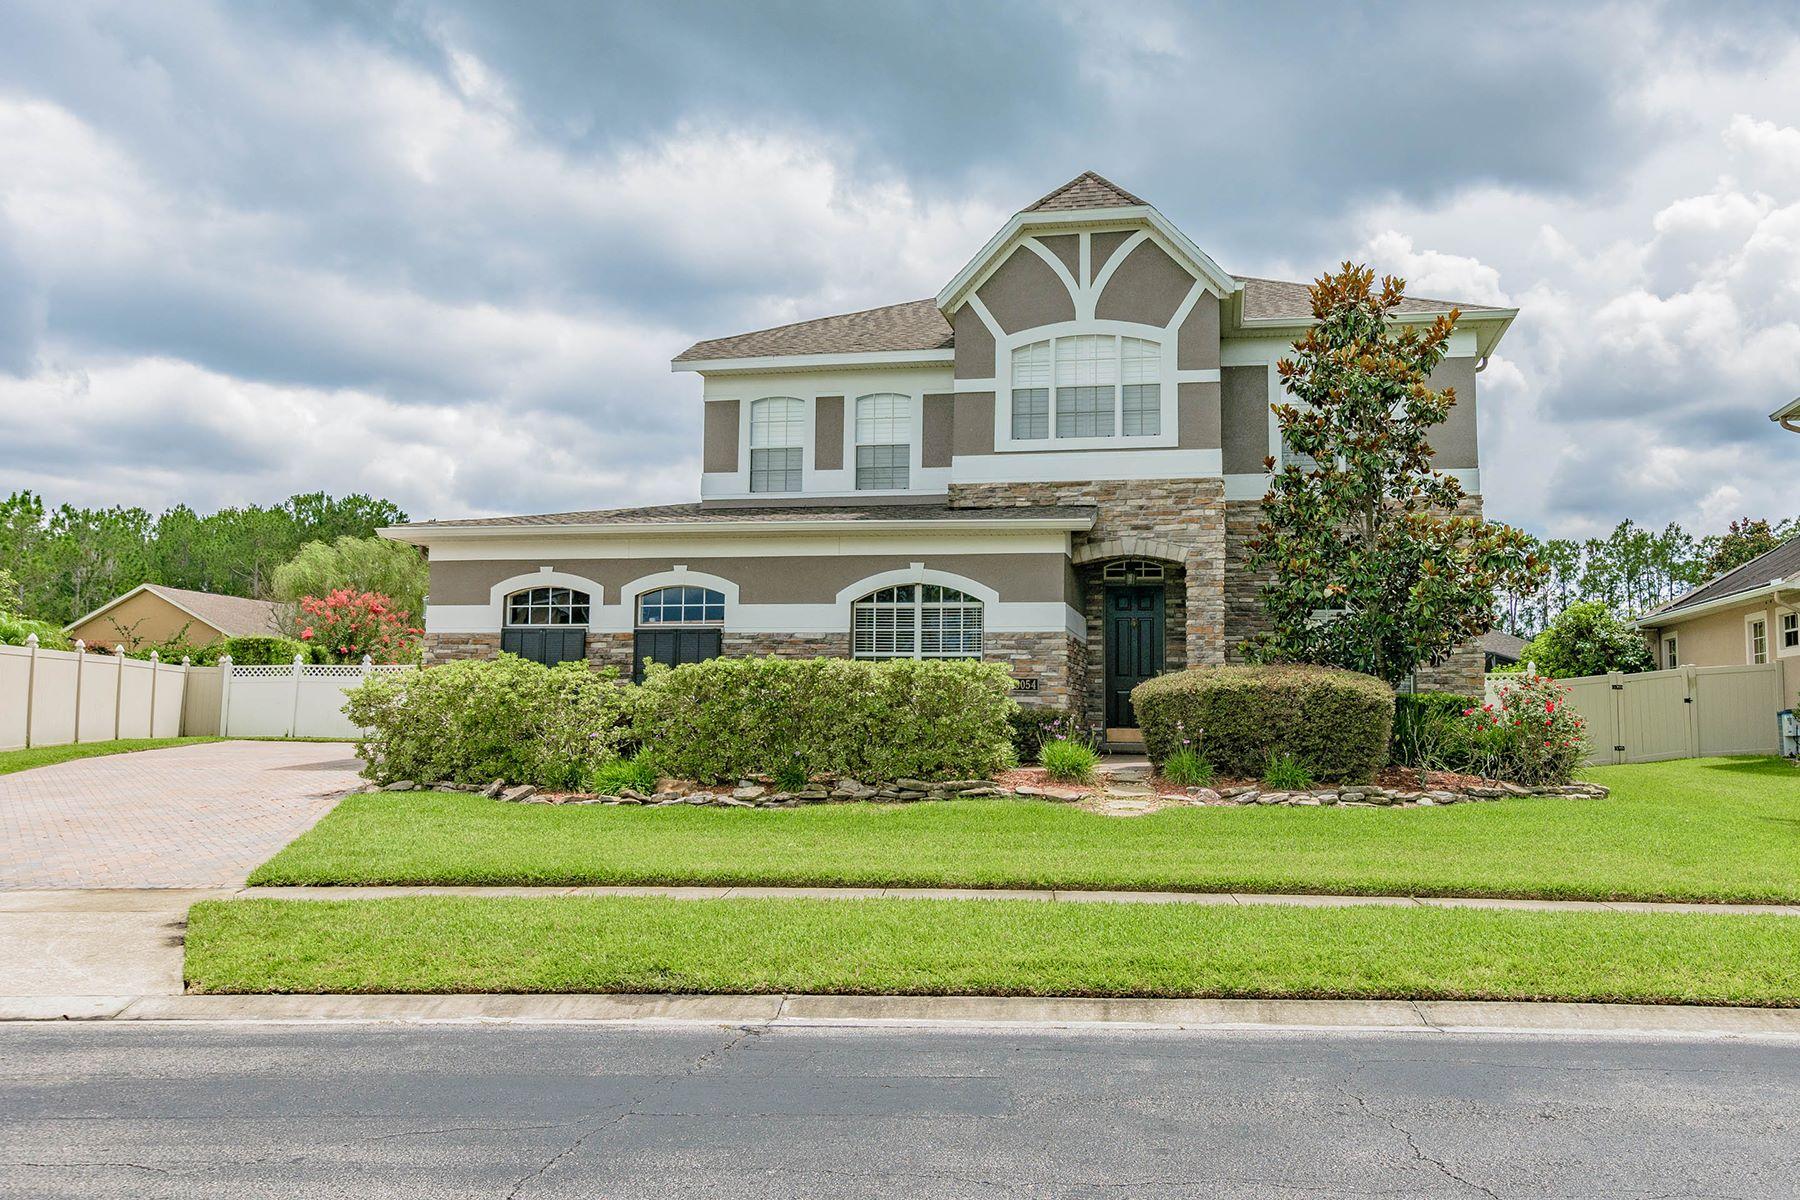 Single Family Home for Sale at ORLANDO - SANFORD 5054 Otters Den Trl Sanford, Florida 32771 United States